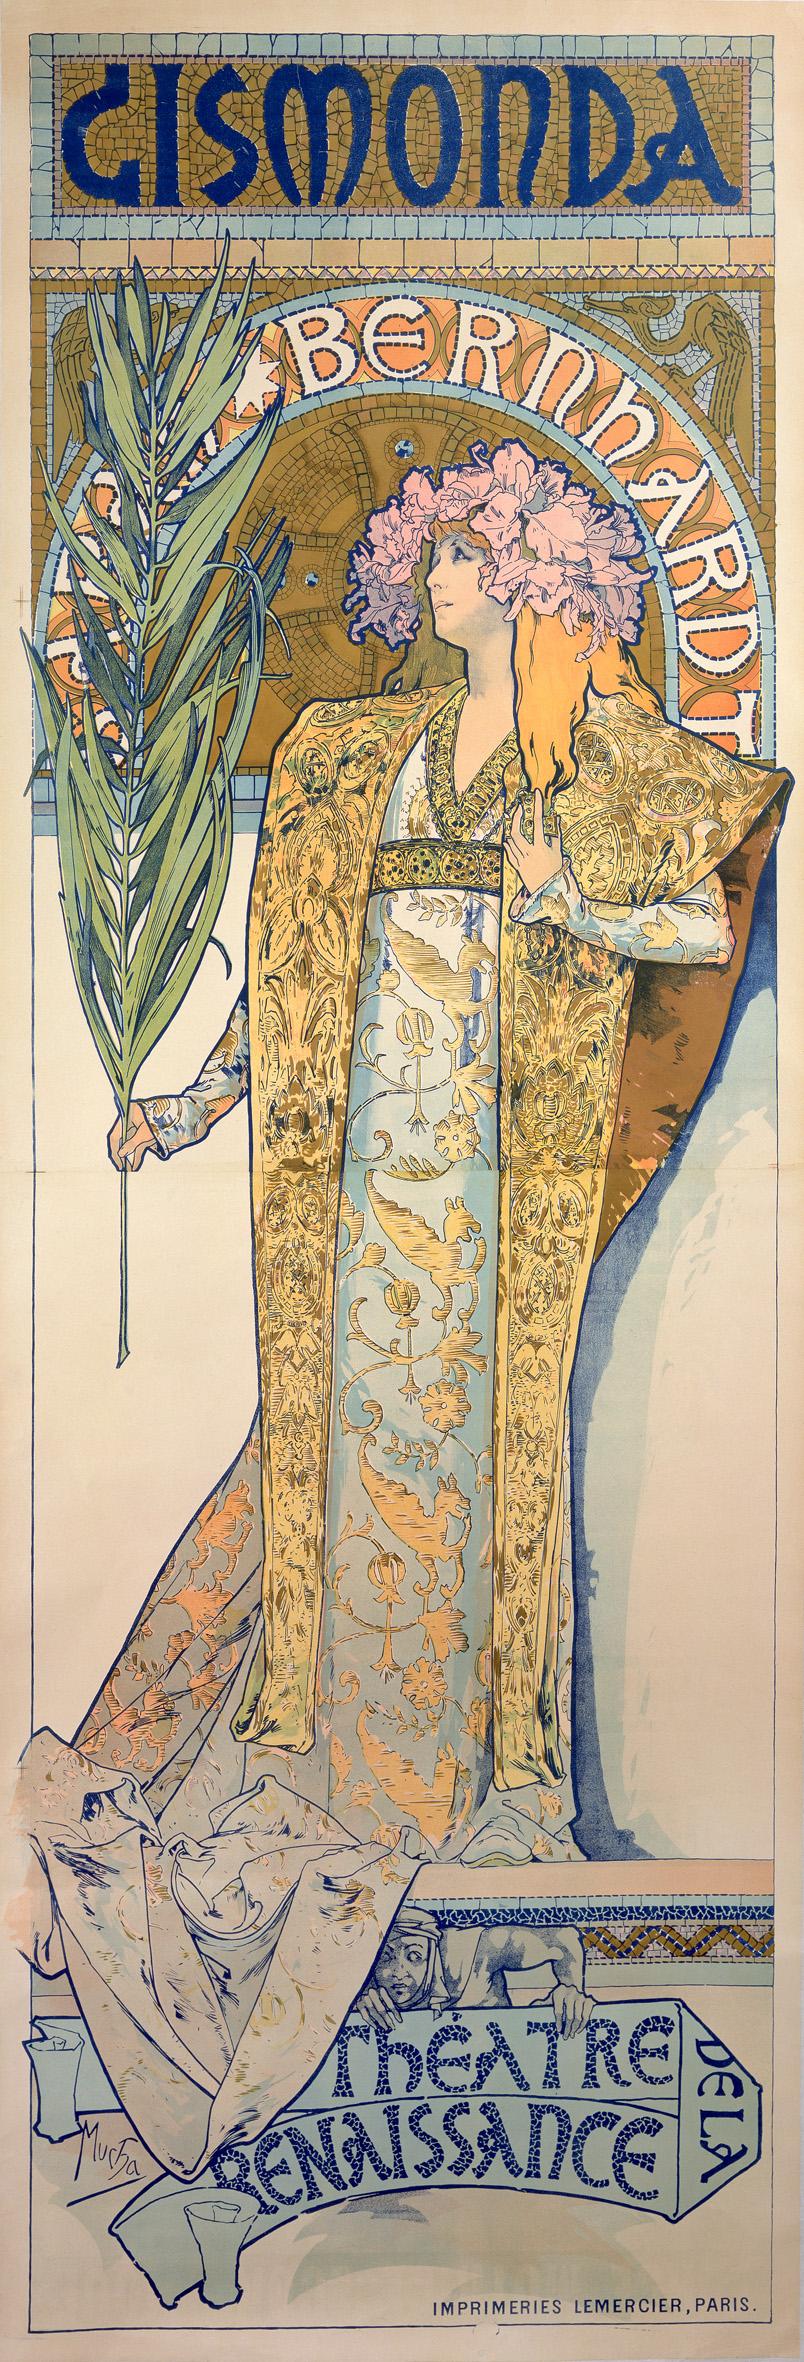 Alphonse Mucha Gismonda 1894 Litografia a colori, 216x74,2 cm © Mucha Trust 2016